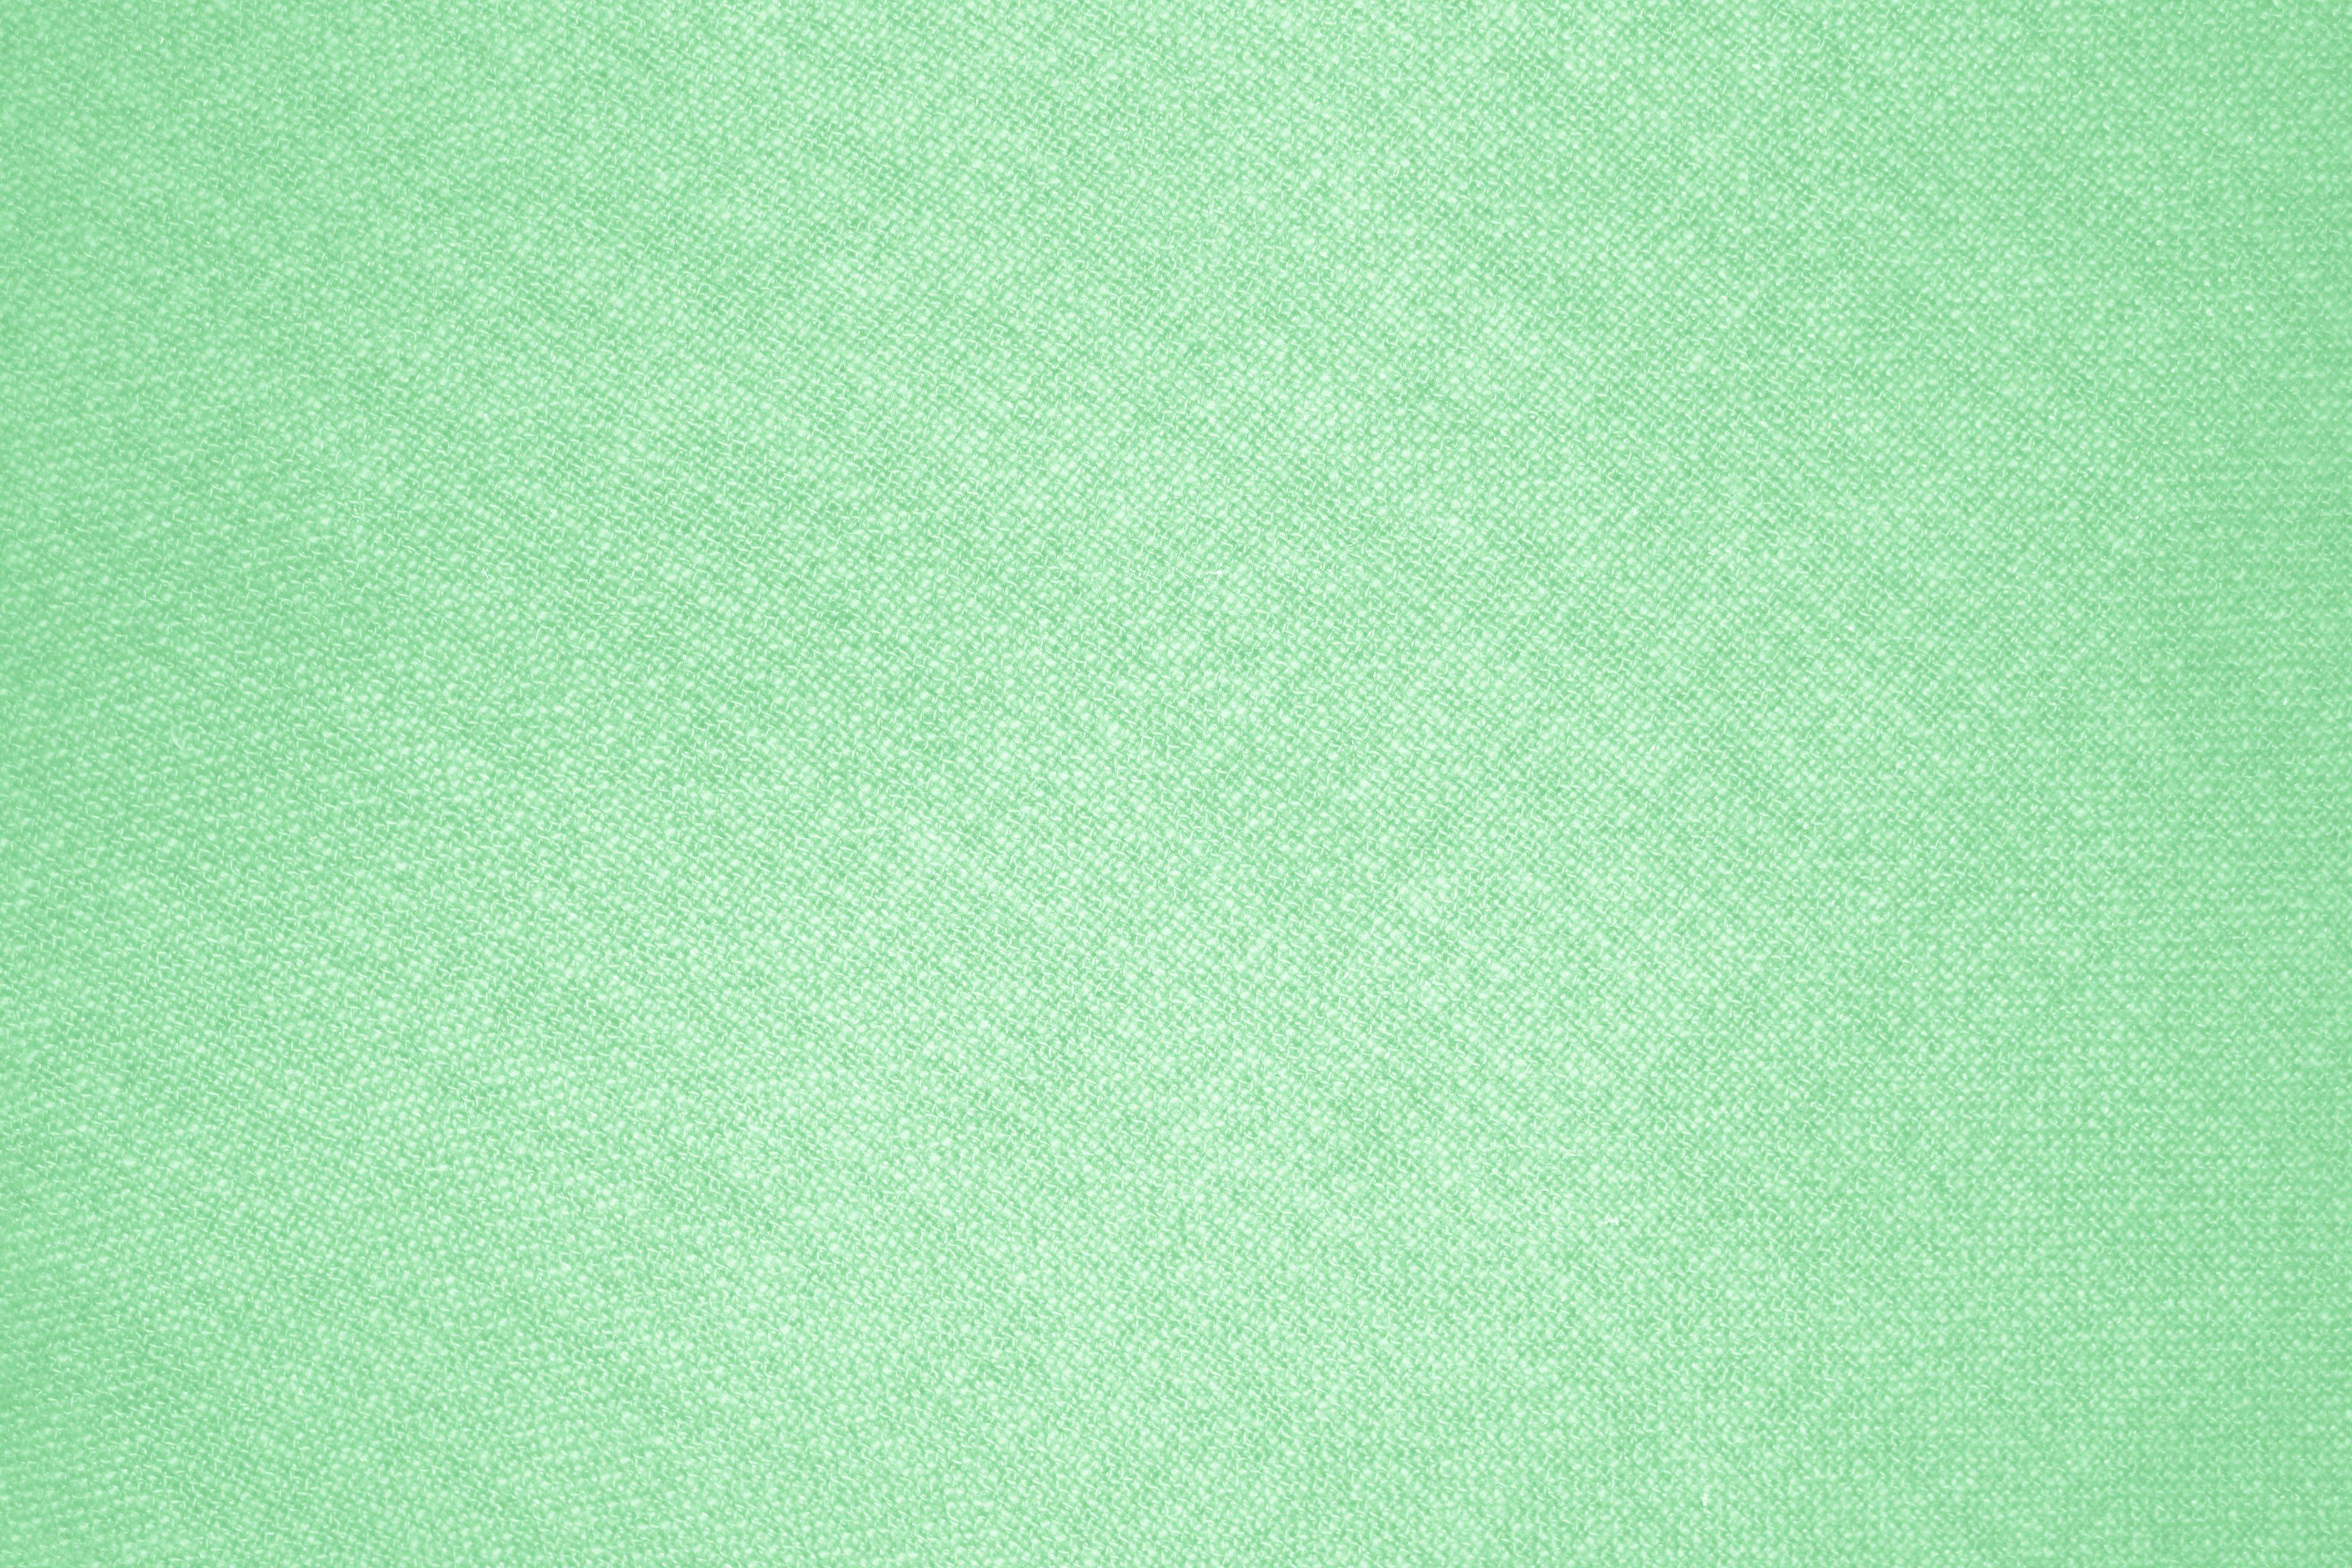 Light Green Fabric Texture Picture Photograph Photos Public 3888x2592